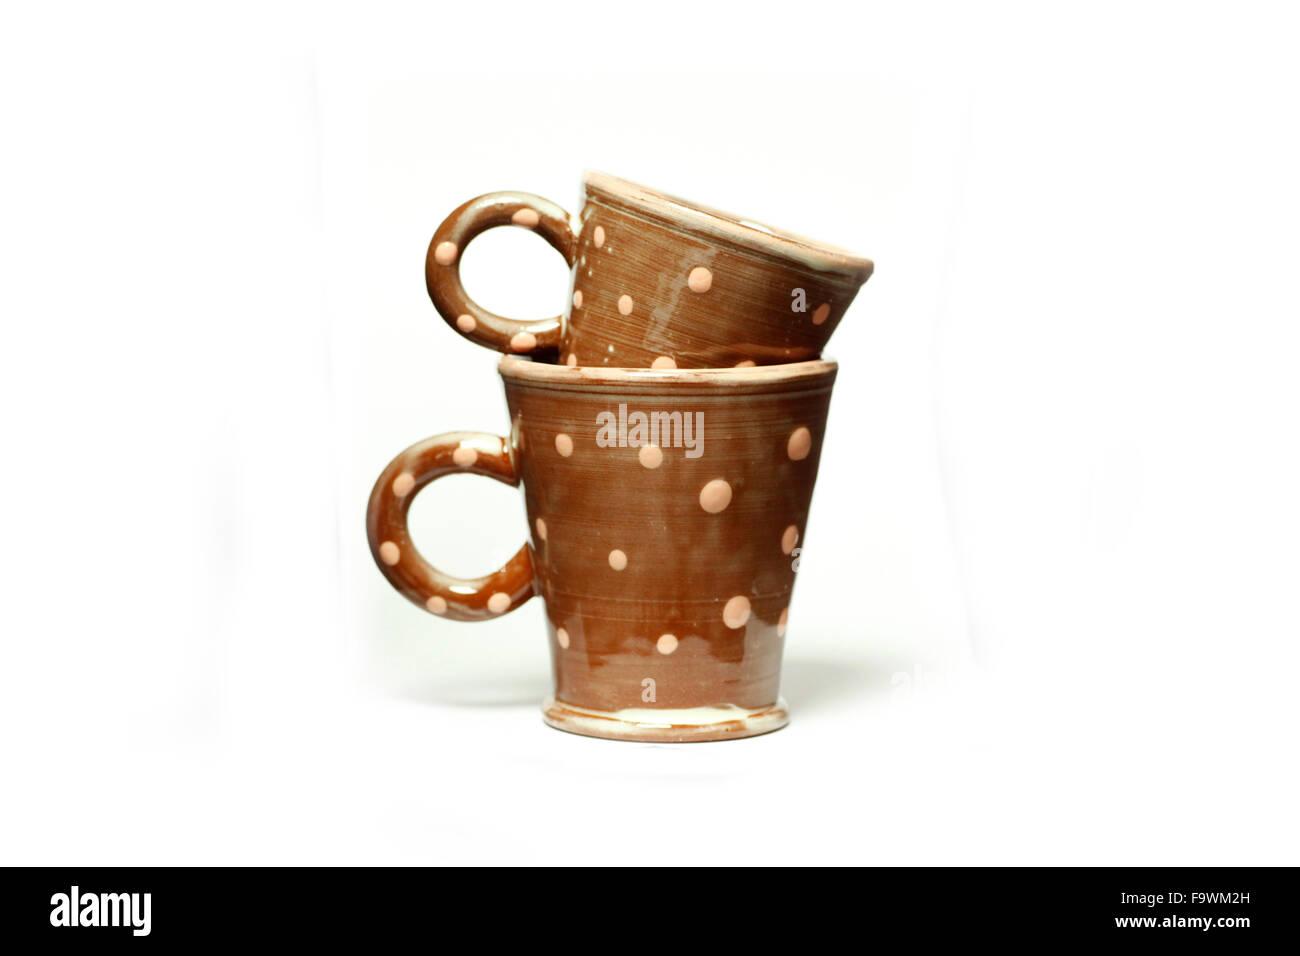 Artisan ceramic mugs made by Sally Bettridge isolated on a white studio background. - Stock Image